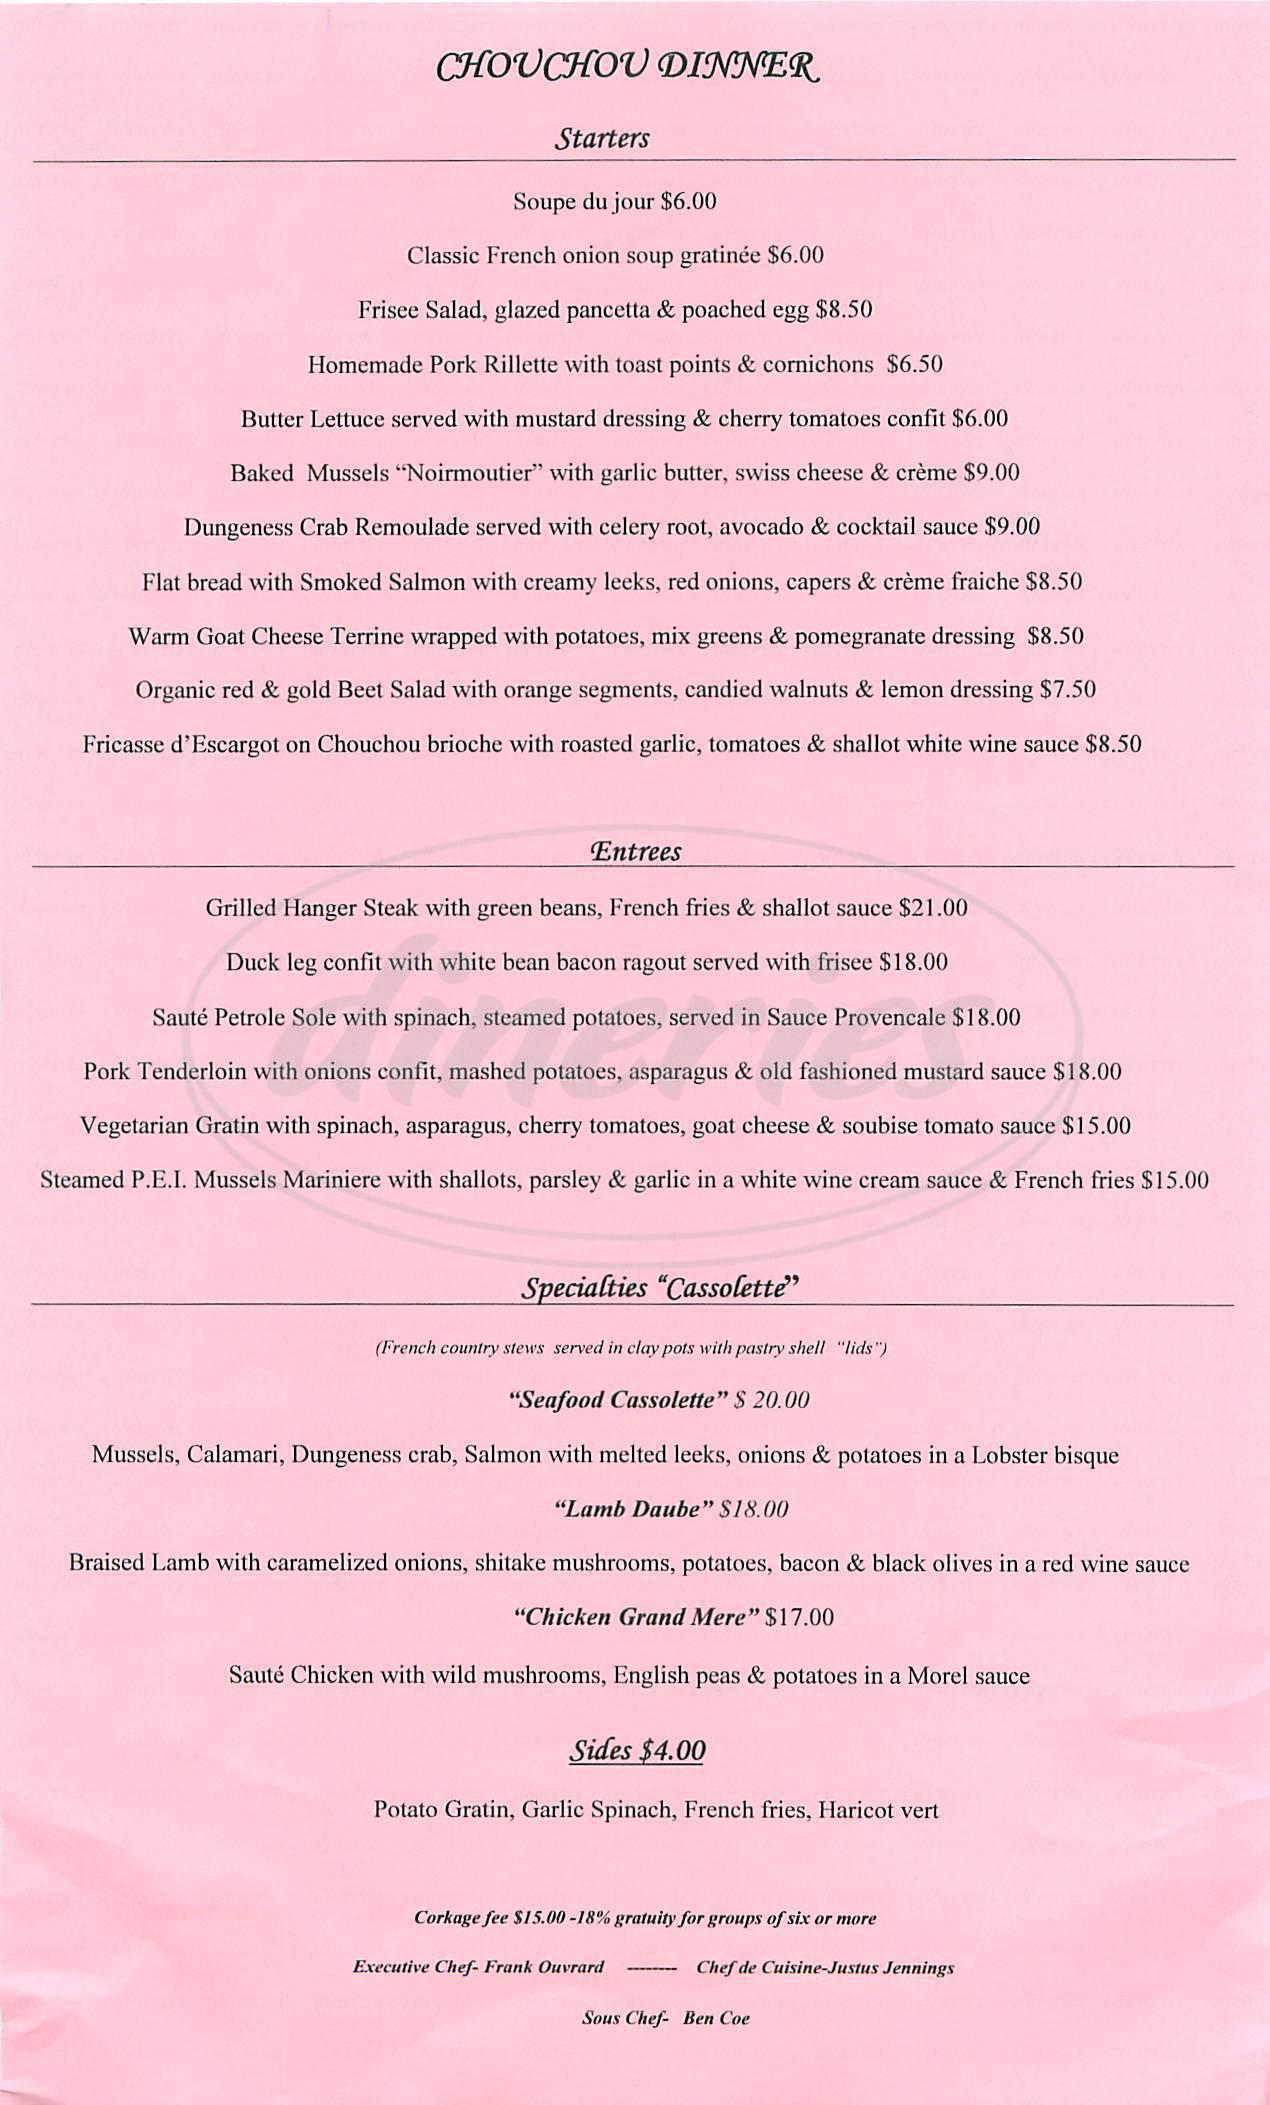 menu for Chouchou